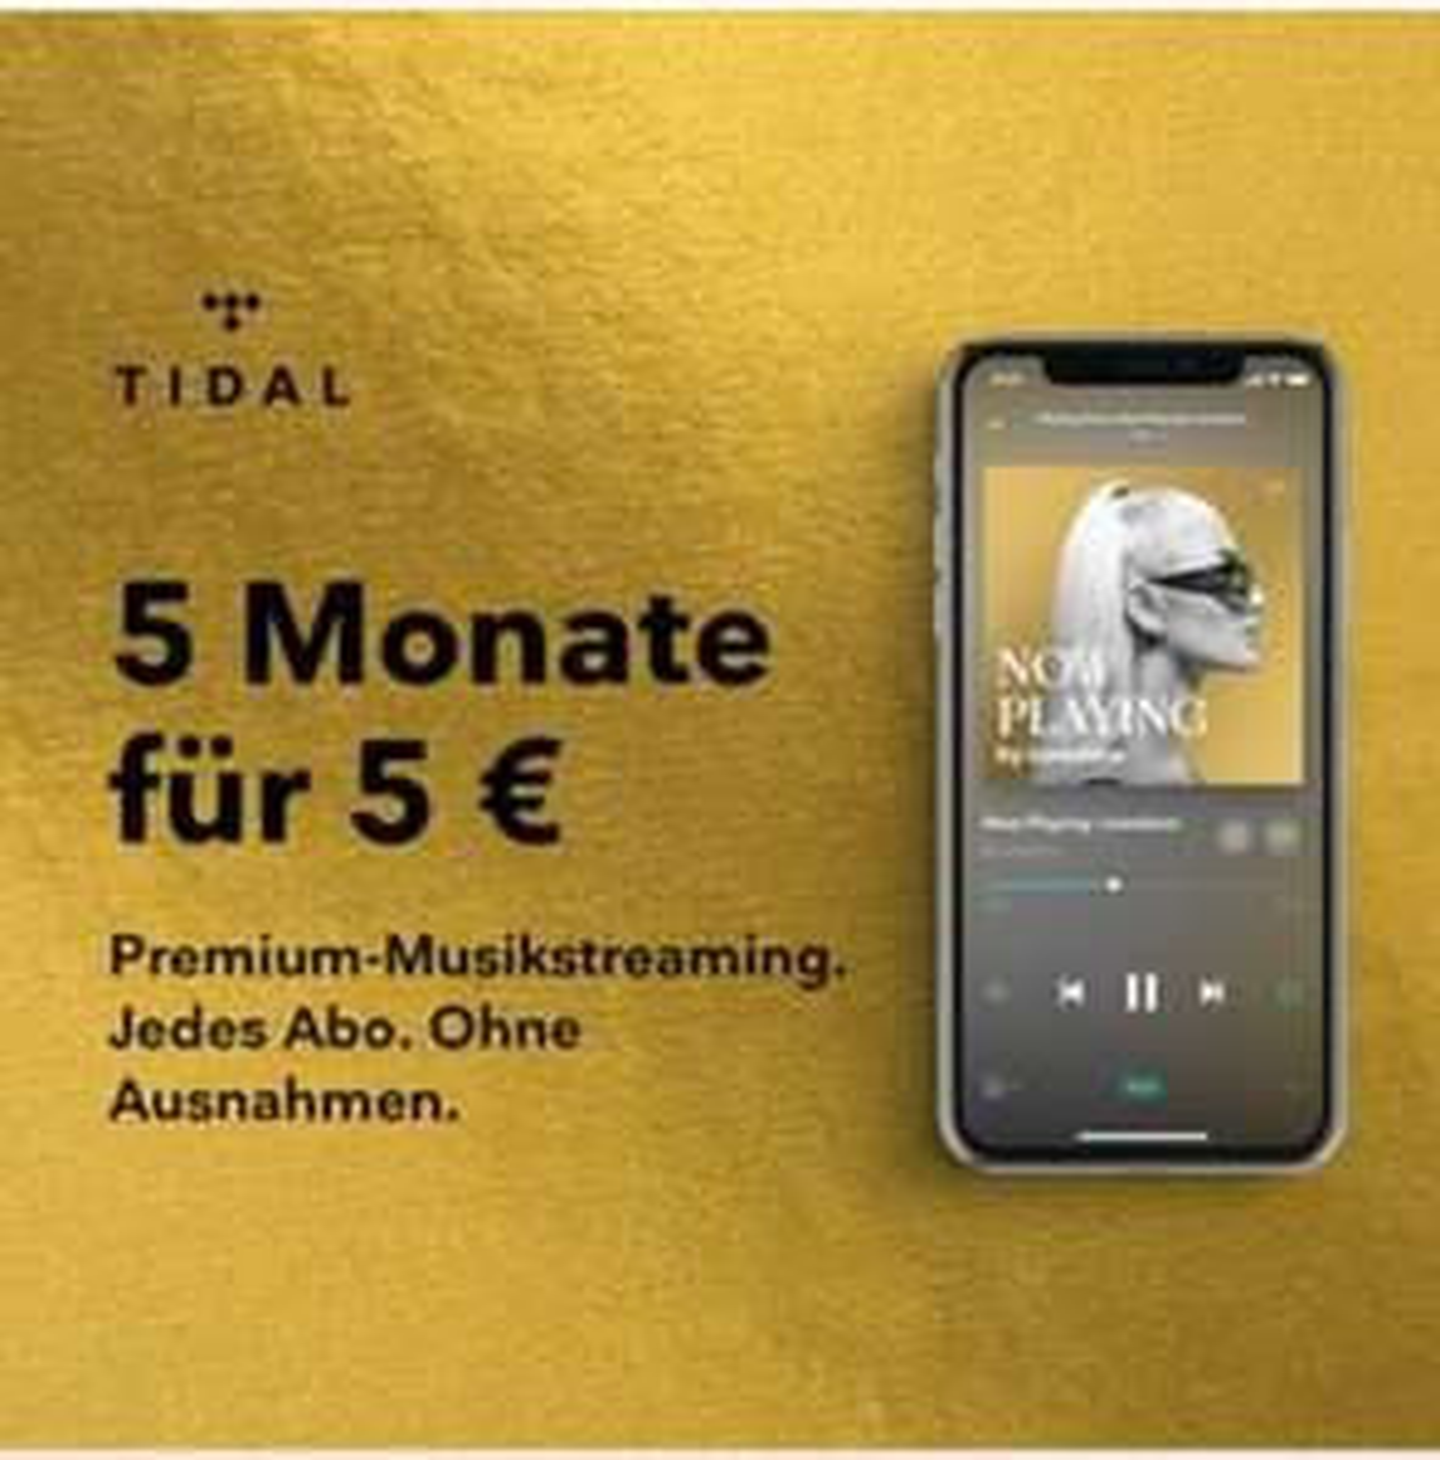 TIDAL Premium-Musikstreaming 5 Monate für 5€ (HiFi)